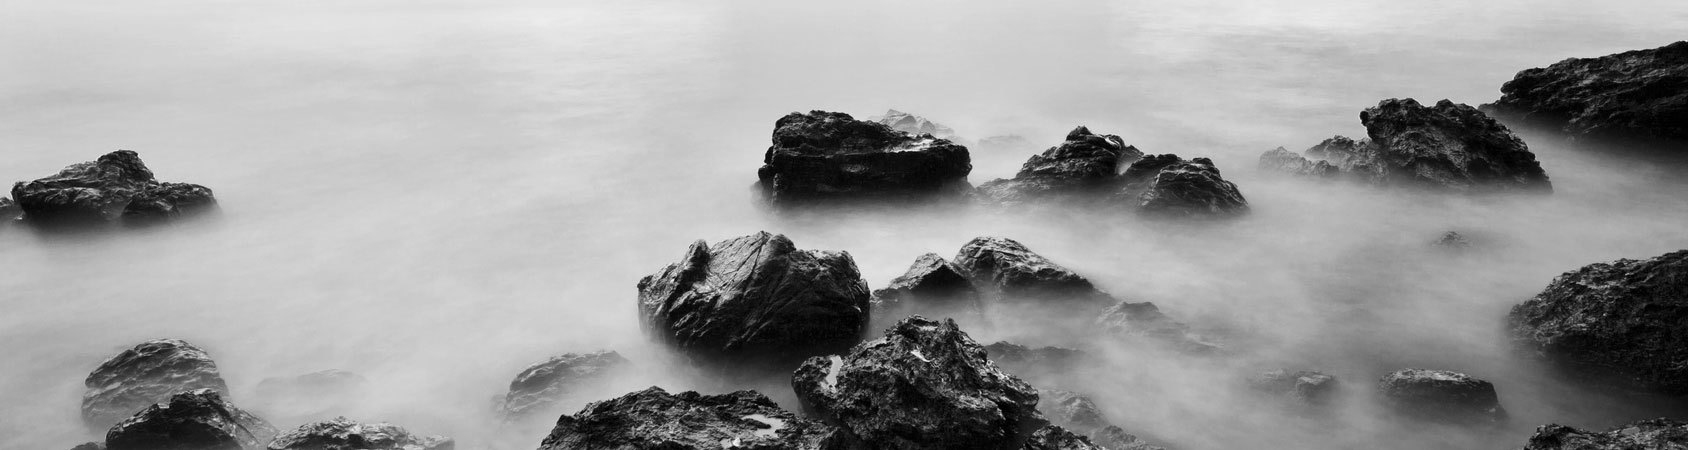 <div class='title'>           rocks-1600-tvbrwd         </div>